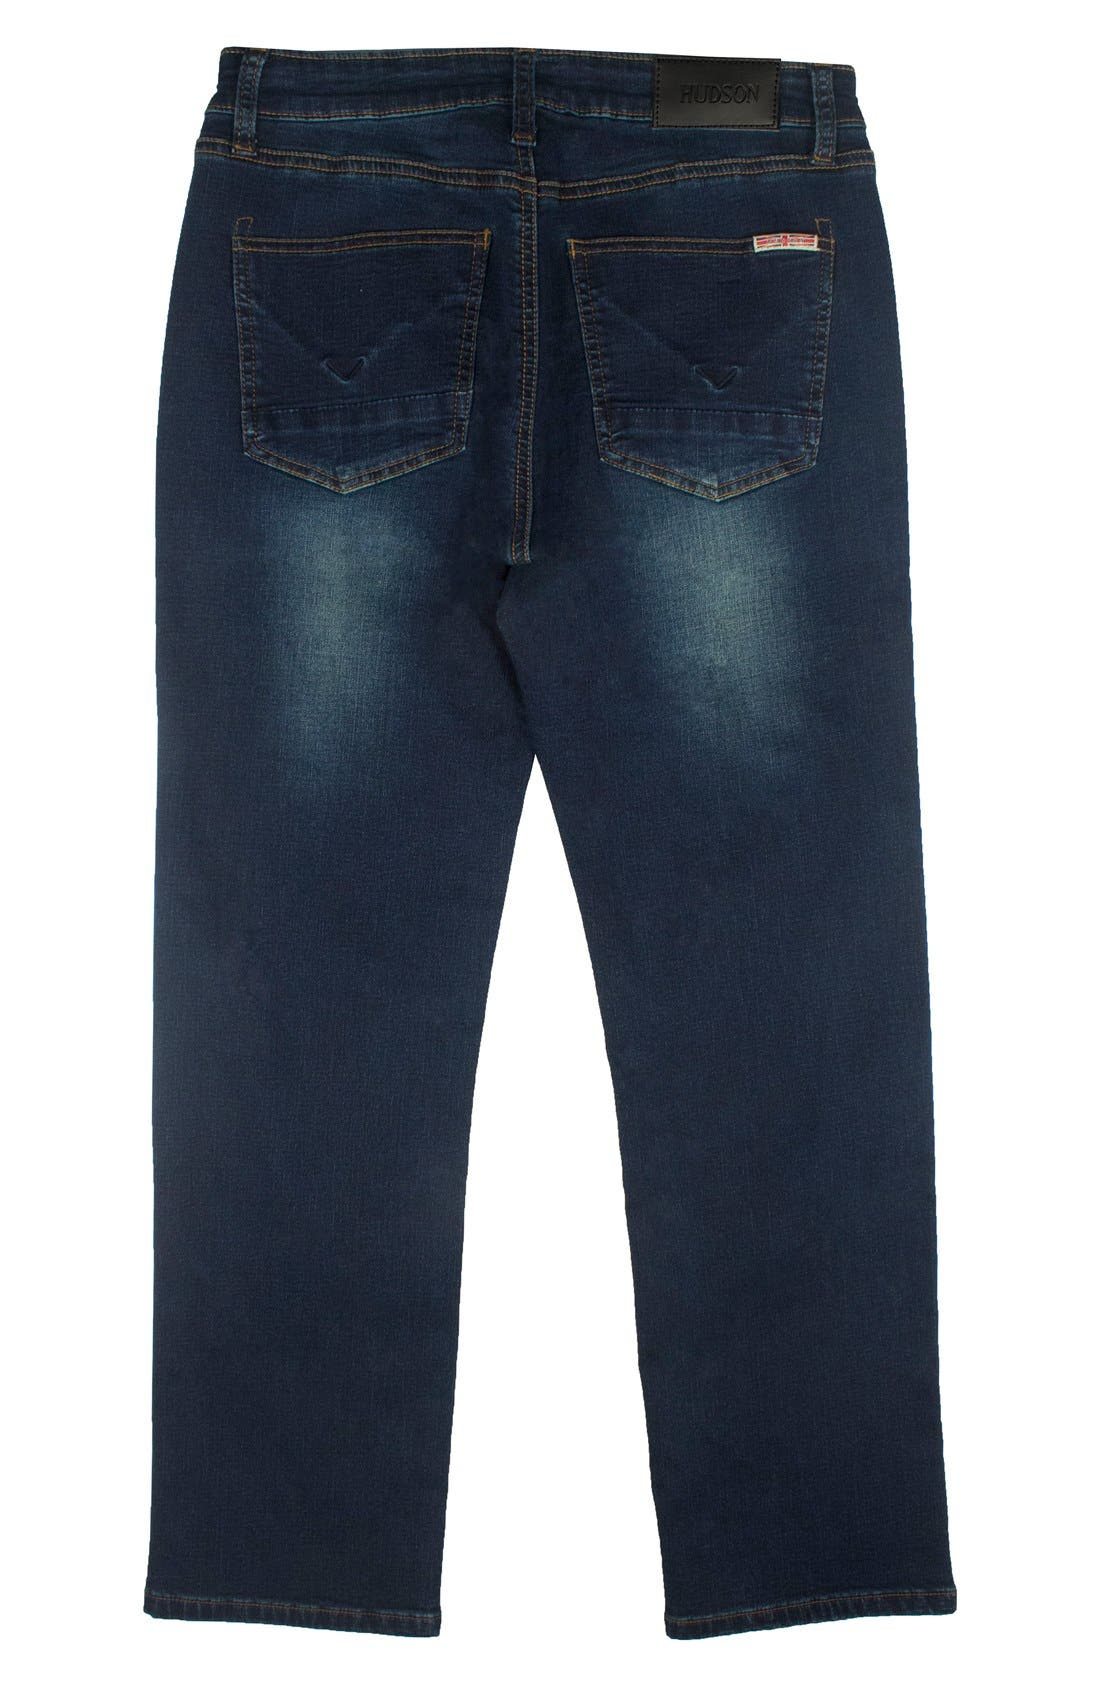 Jagger Slim Fit Straight Leg Jeans,                             Alternate thumbnail 8, color,